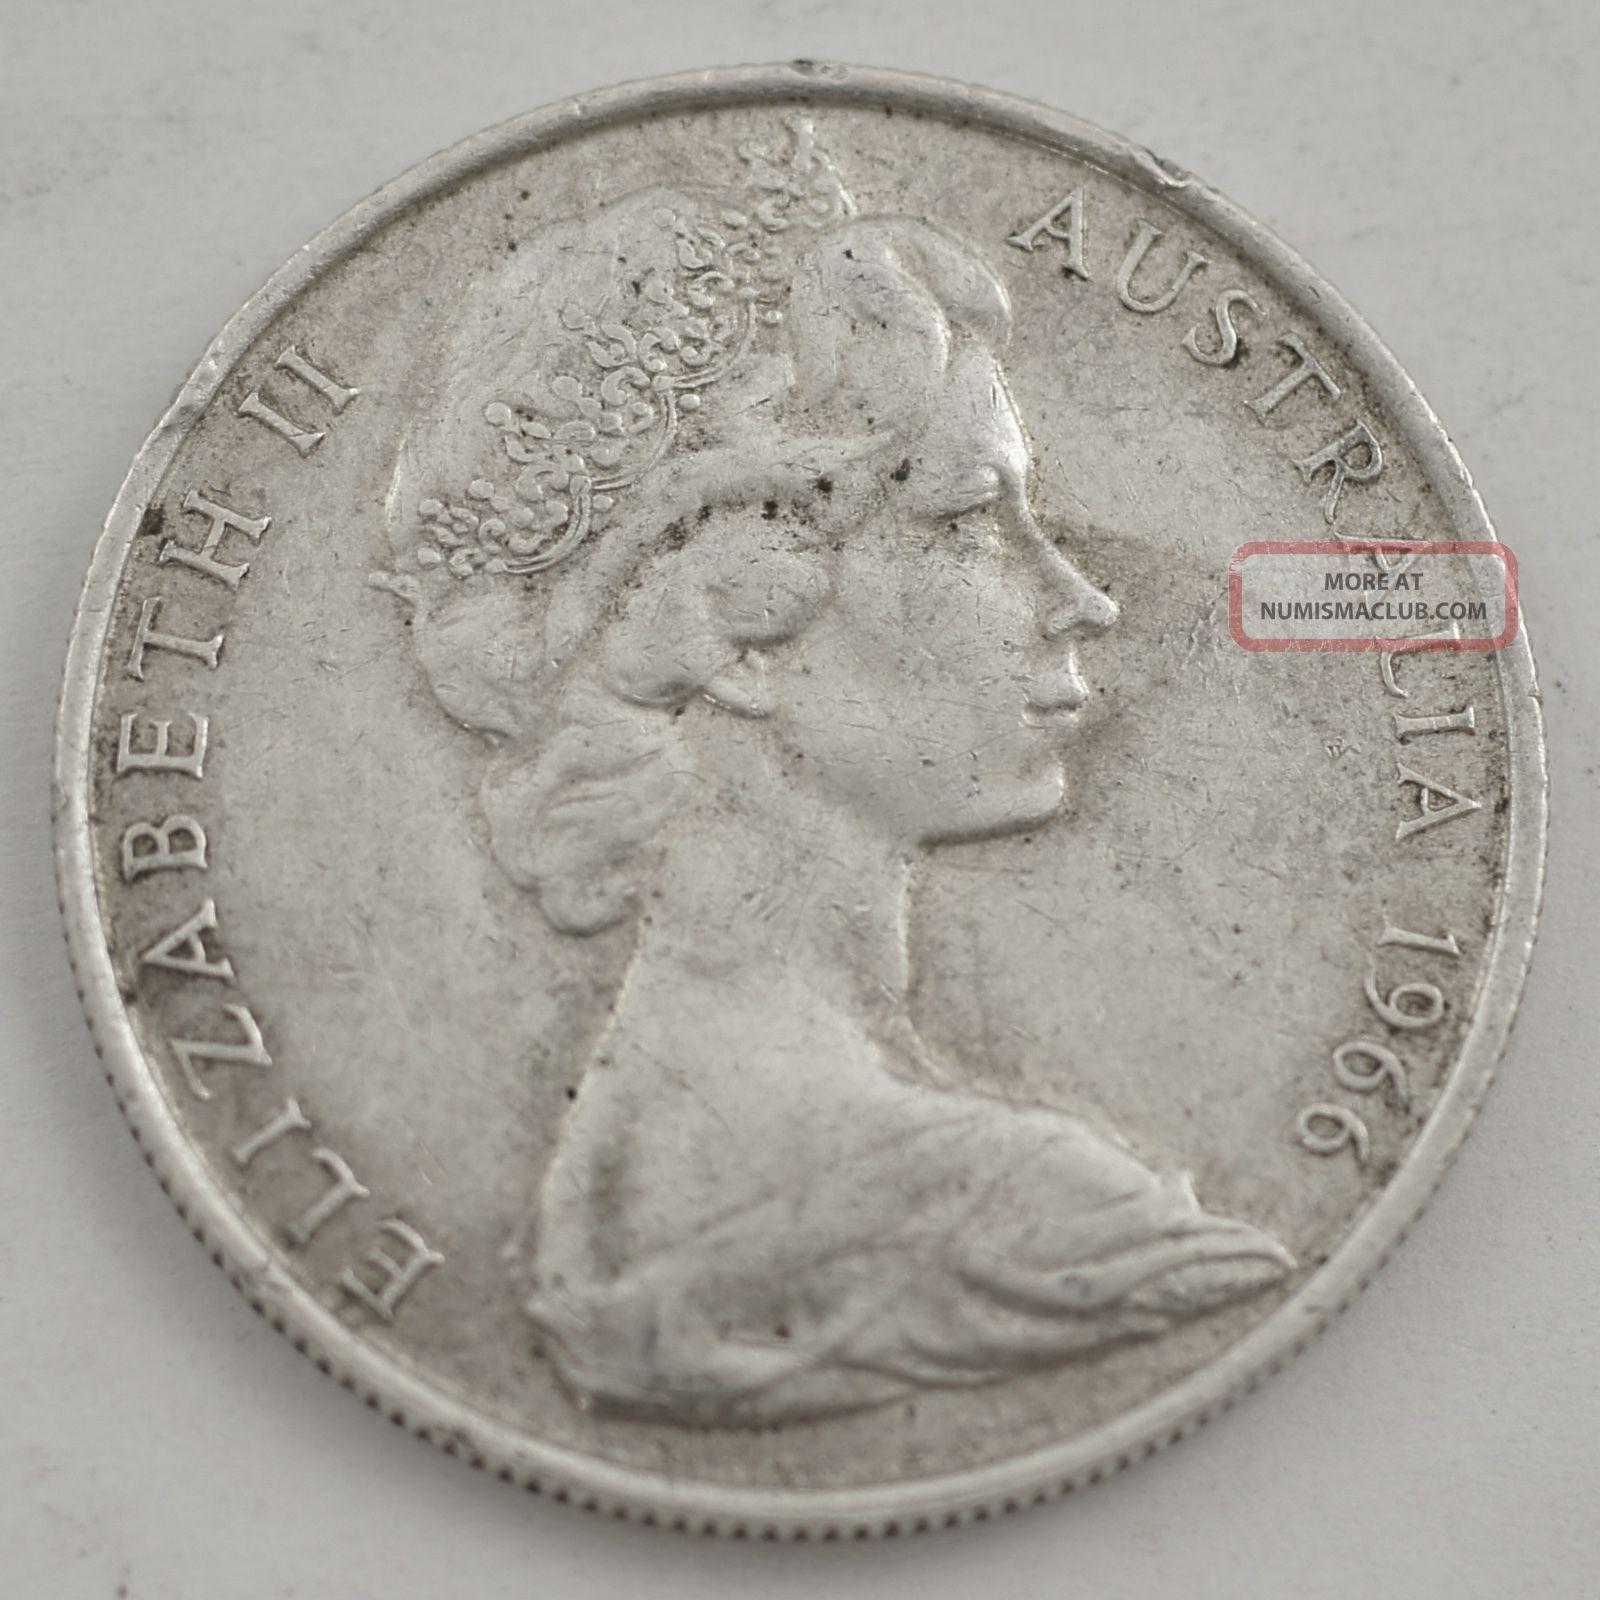 1966 Australia 50 Cent Silver Coin